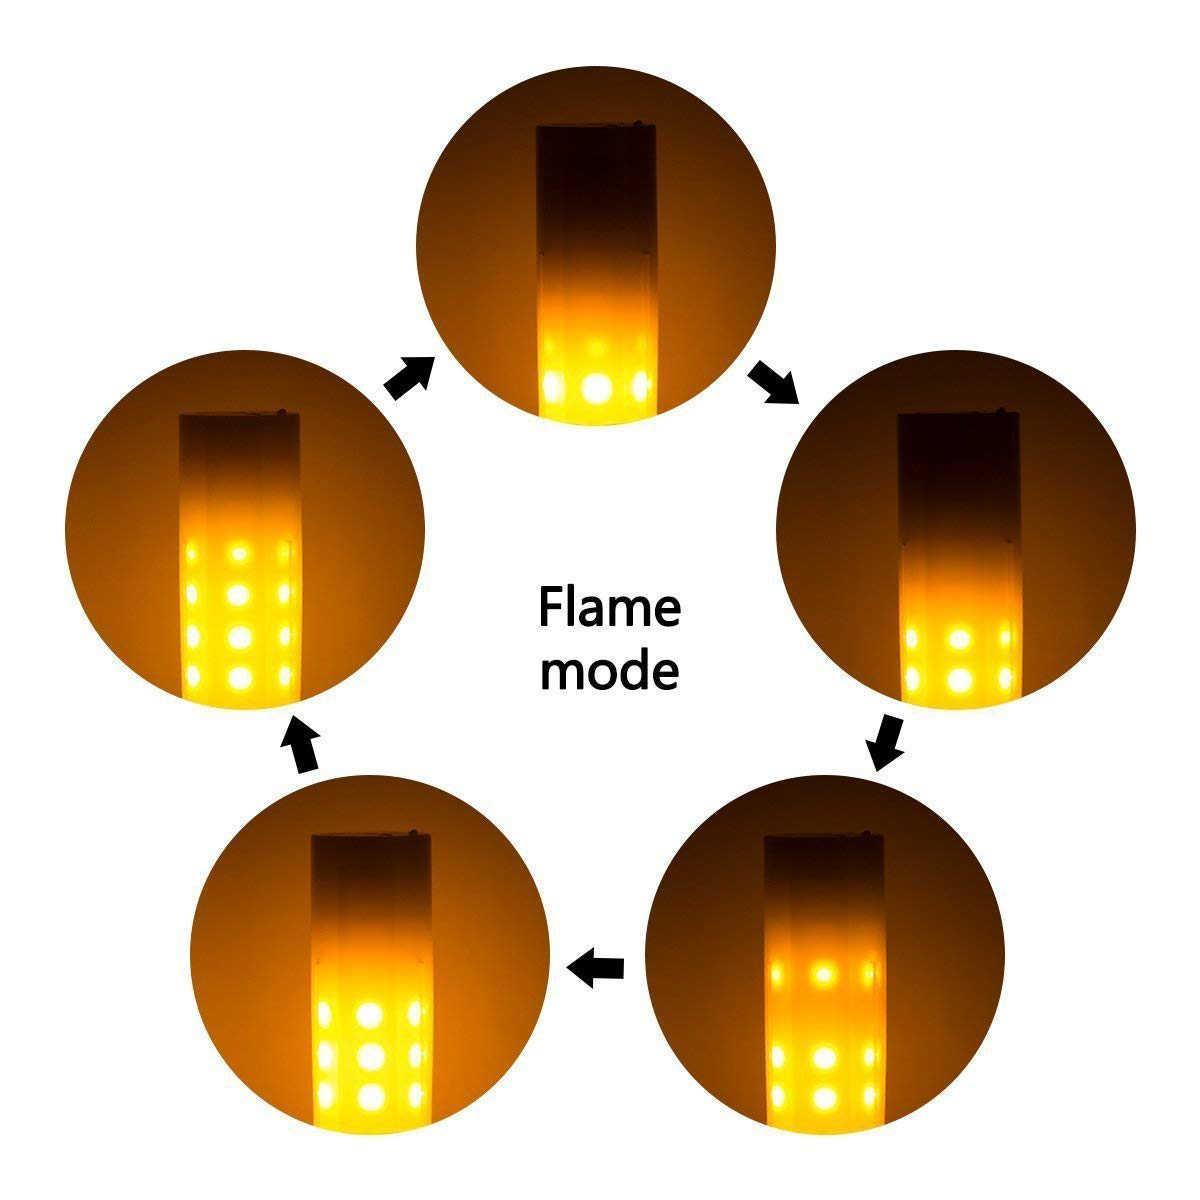 2Pcs 3W 230 Lm G4 LED Lampu 36 LED SMD 2835 Api Efek Hangat Putih DC 12V (Hangat Putih DC12V)